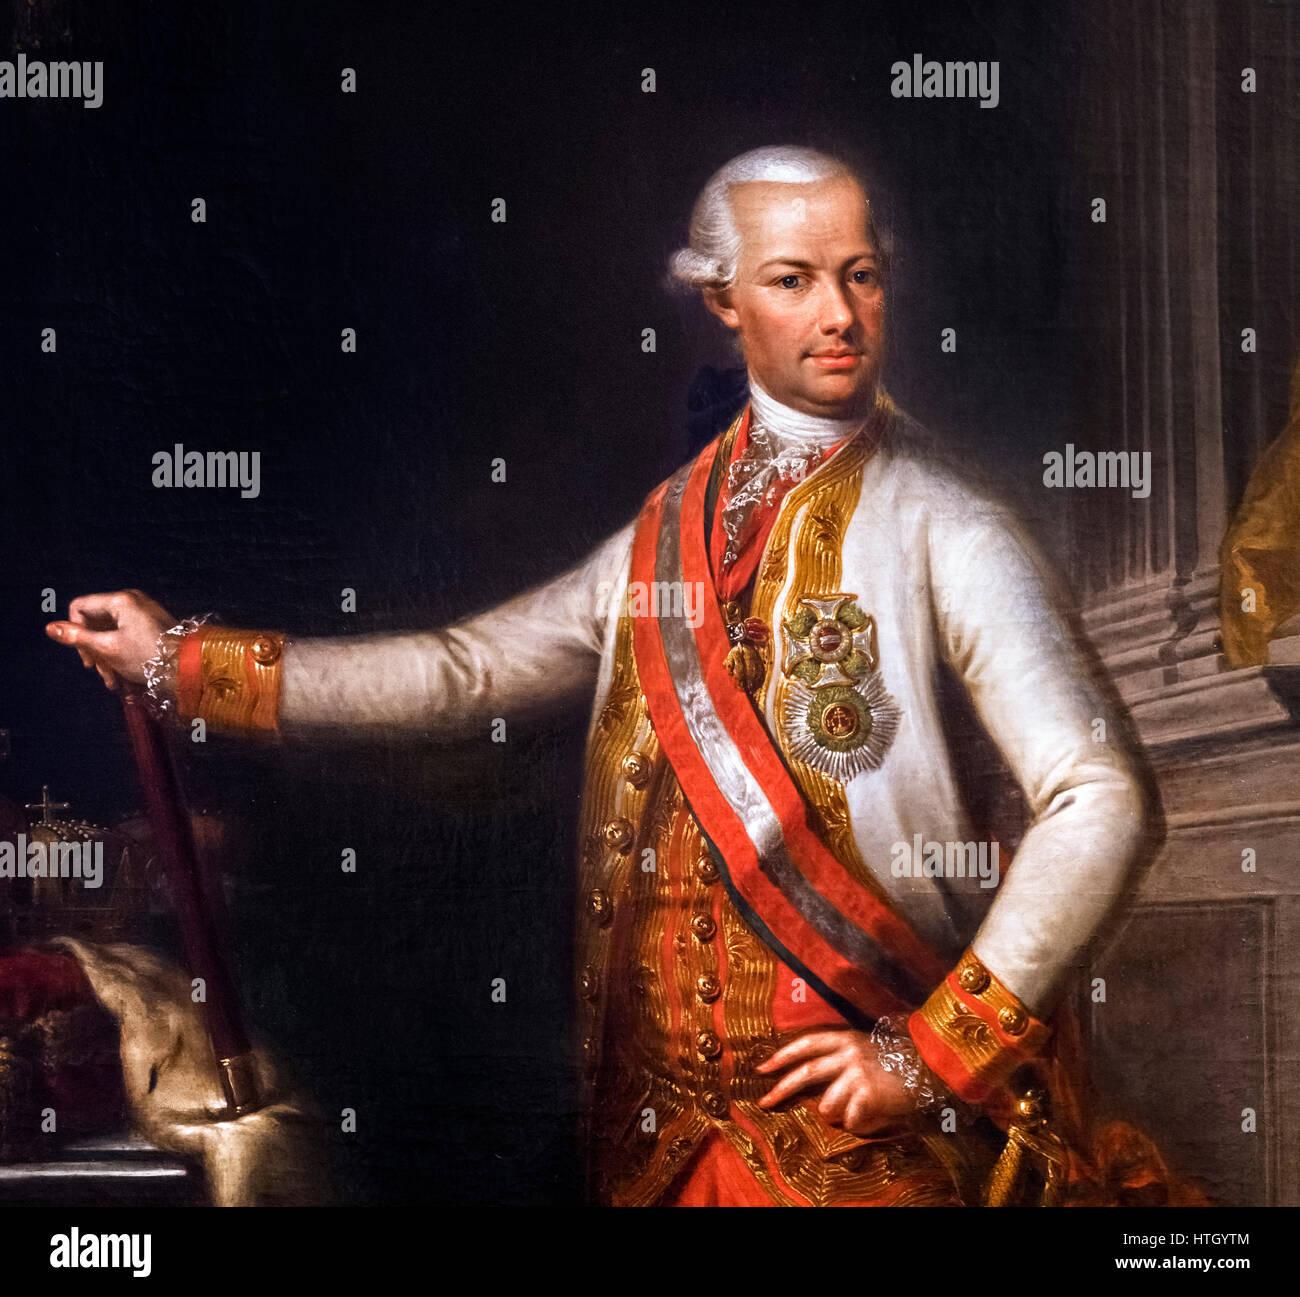 Leopold II (1747-1792), Holy Roman Emperor, King of Hungary and Bohemia, Archduke of Austria and Grand Duke of Tuscany. - Stock Image